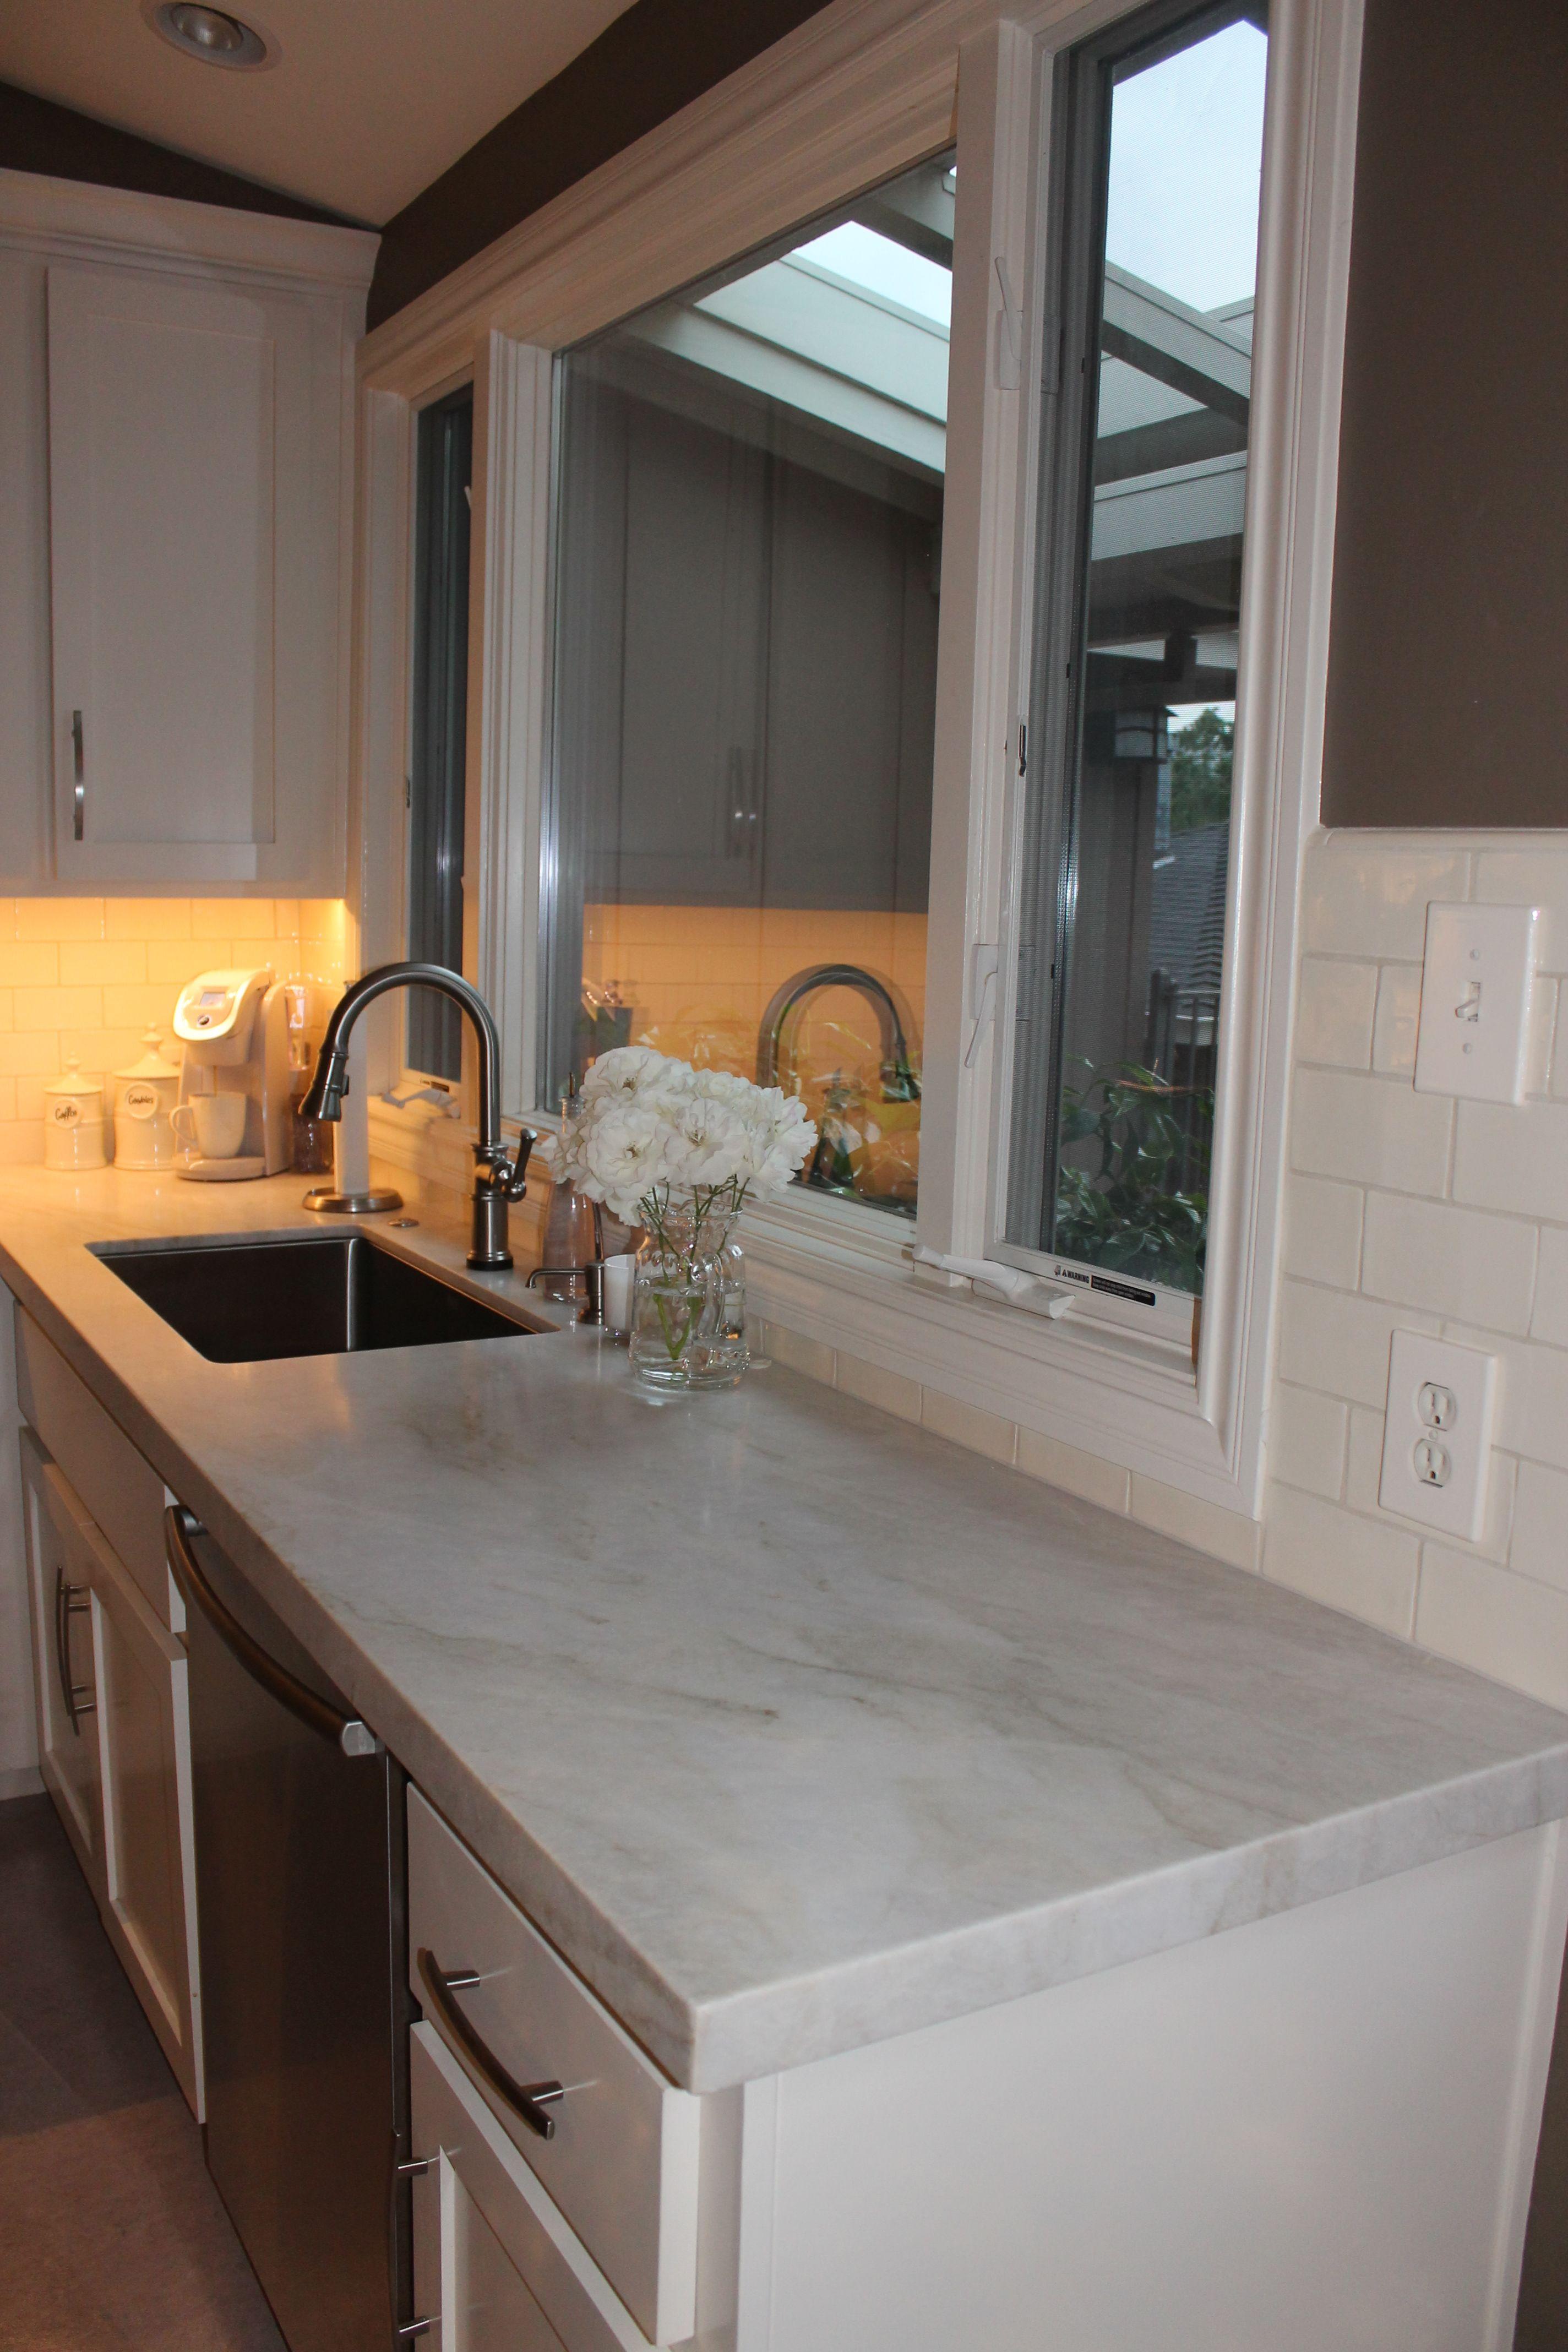 Walker Zanger Honed Perla Venata Quartzite Counters Inches Countertop Design Kitchen